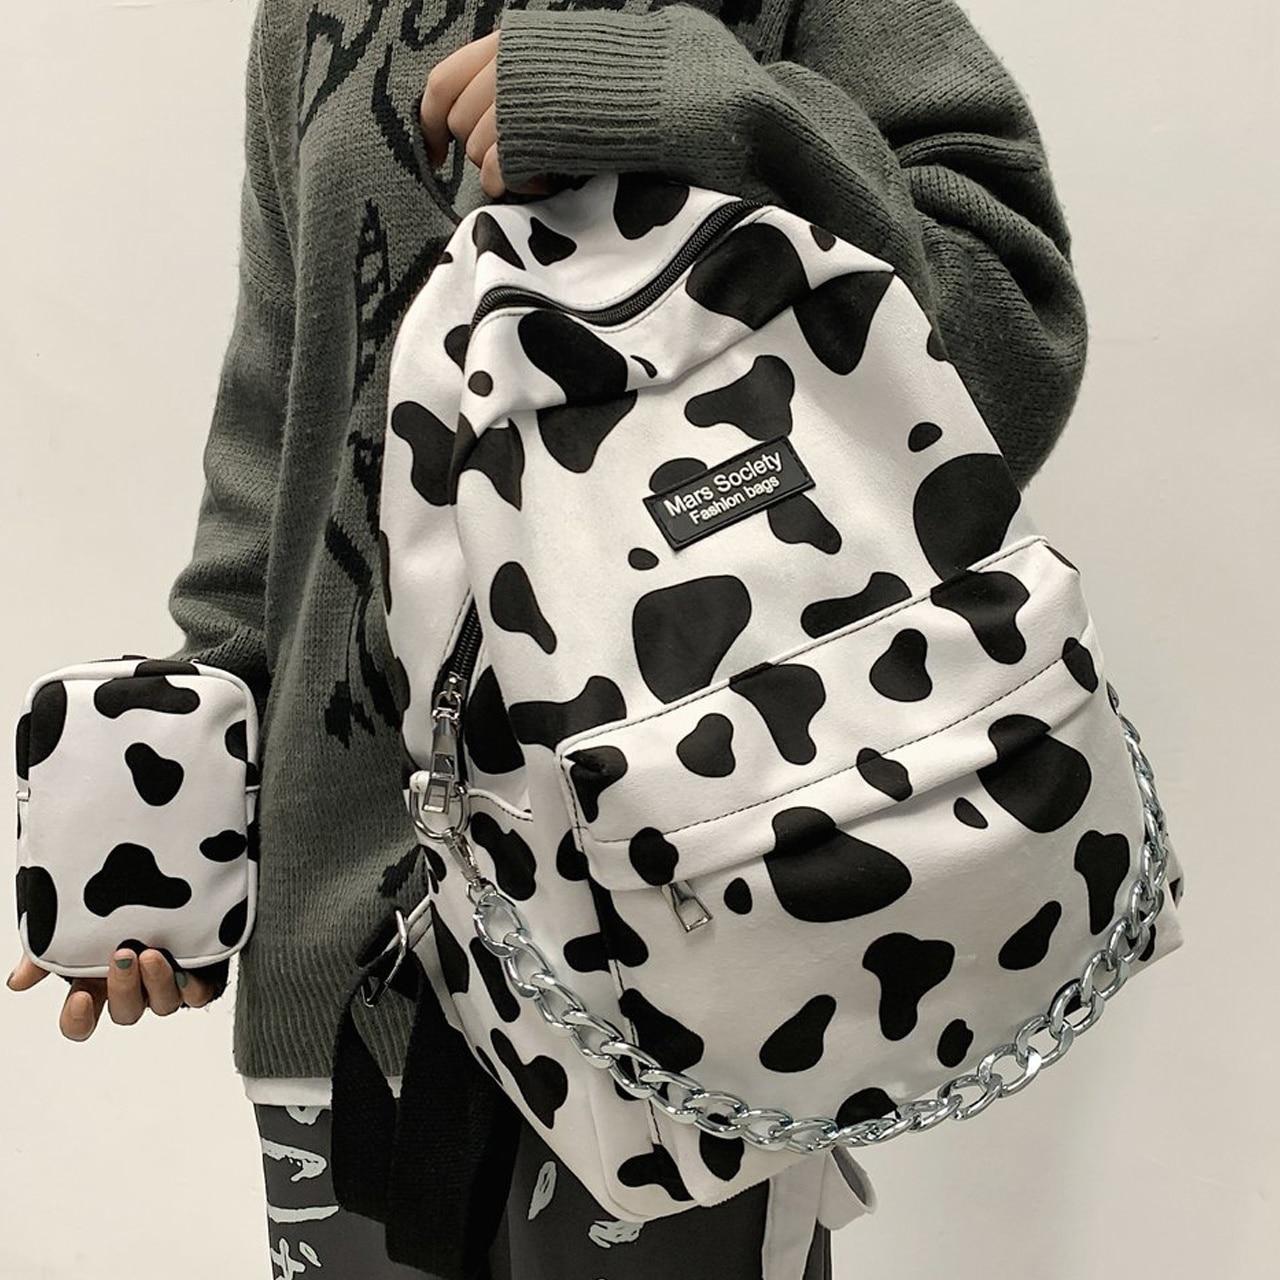 Fashion Cow Print Bags Kawaii Girl Schoolbag for College Bookbag Mochilas Trendy Women Shoulder Back